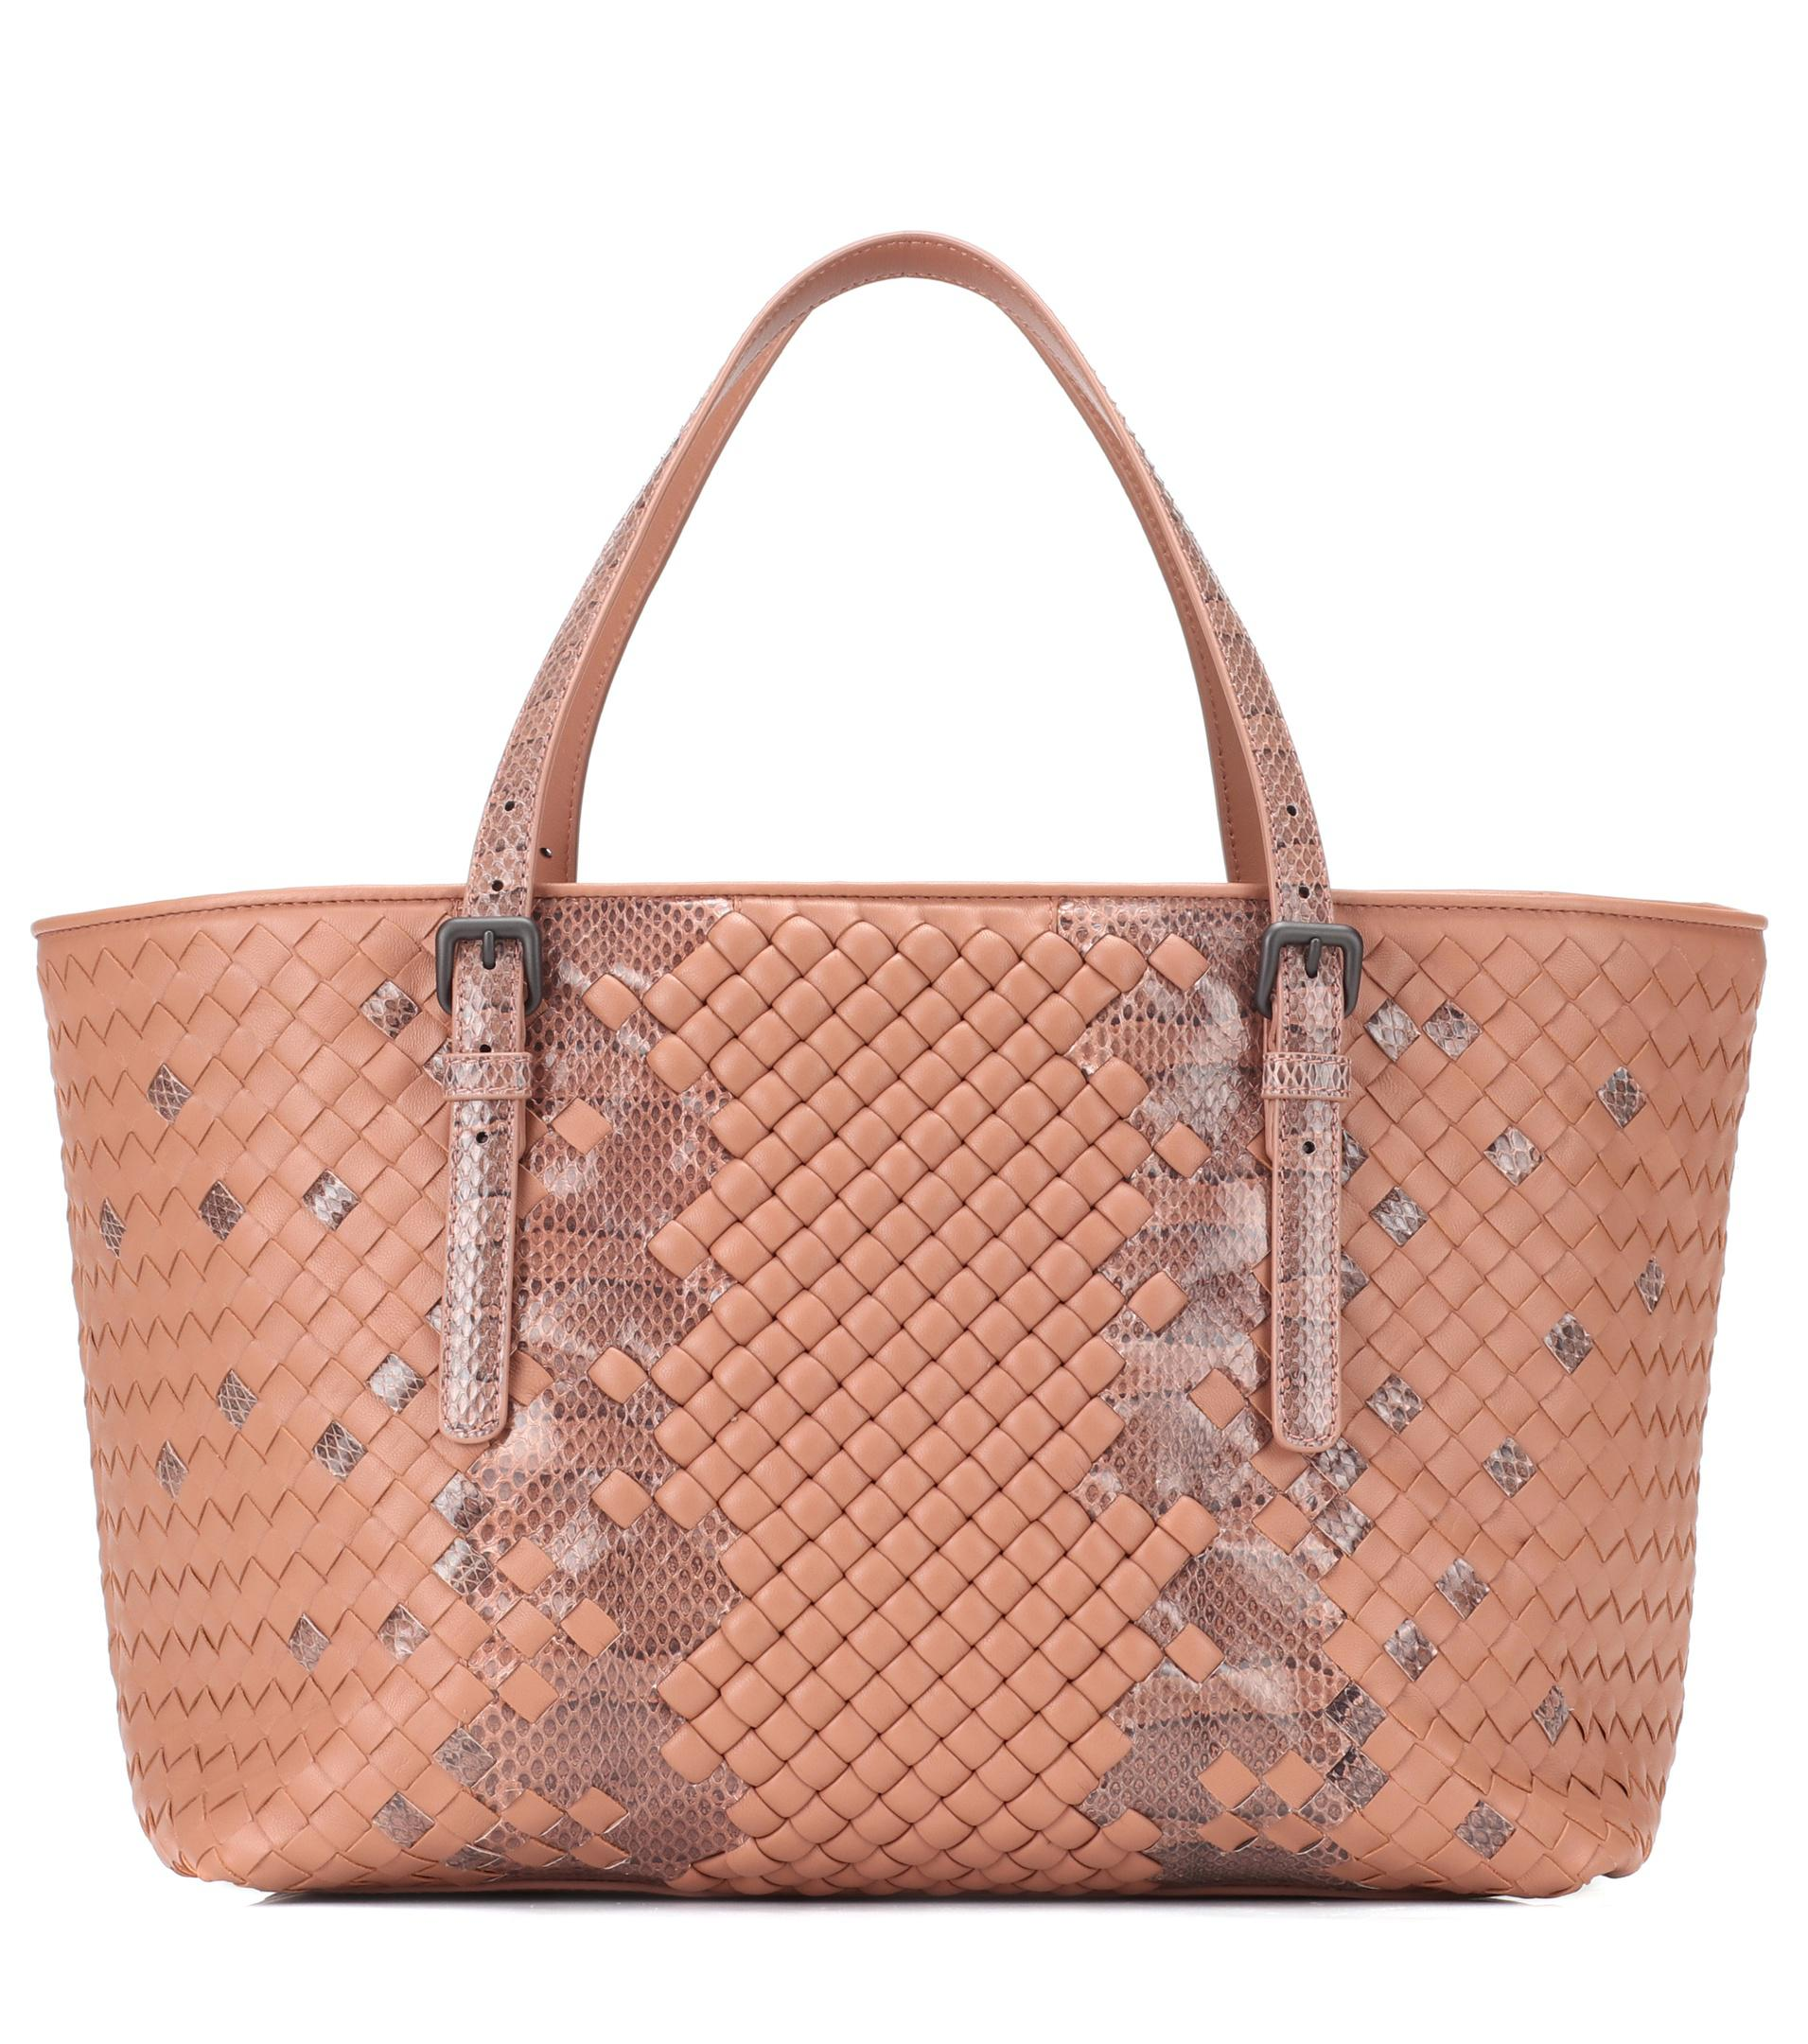 a85f51418d Bottega Veneta Medium Intrecciato Leather Tote in Natural - Lyst